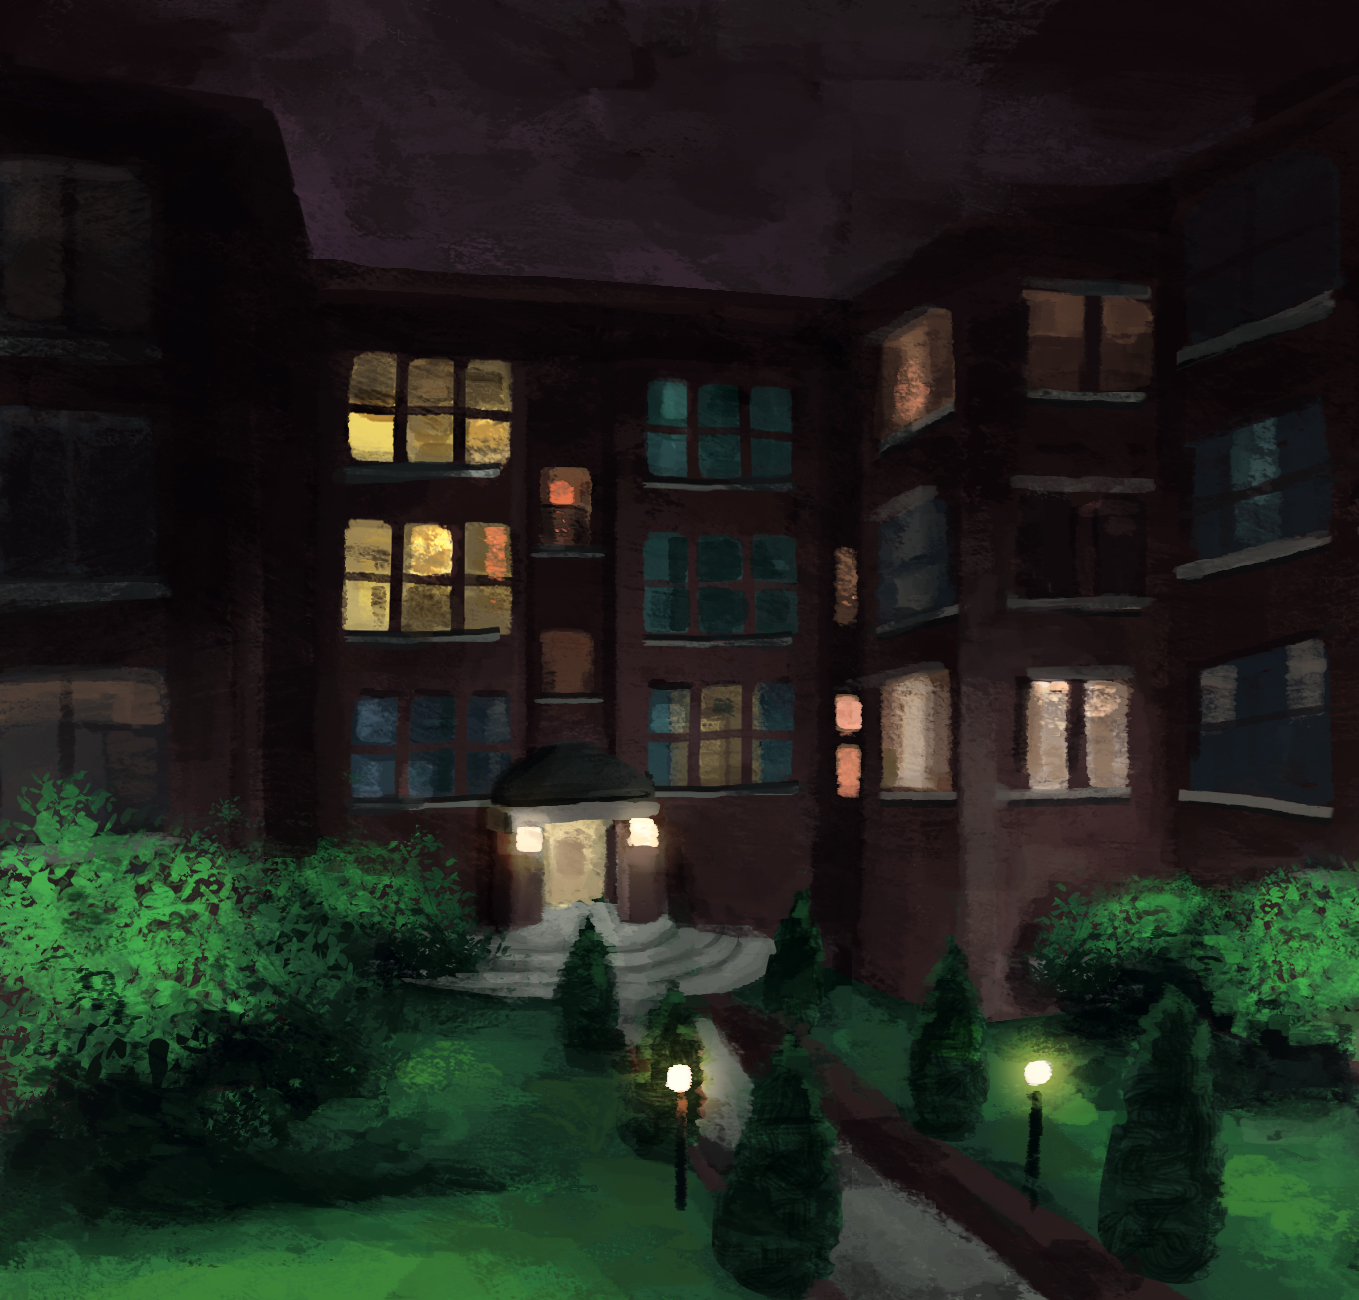 courtyard_night_final_web.jpg